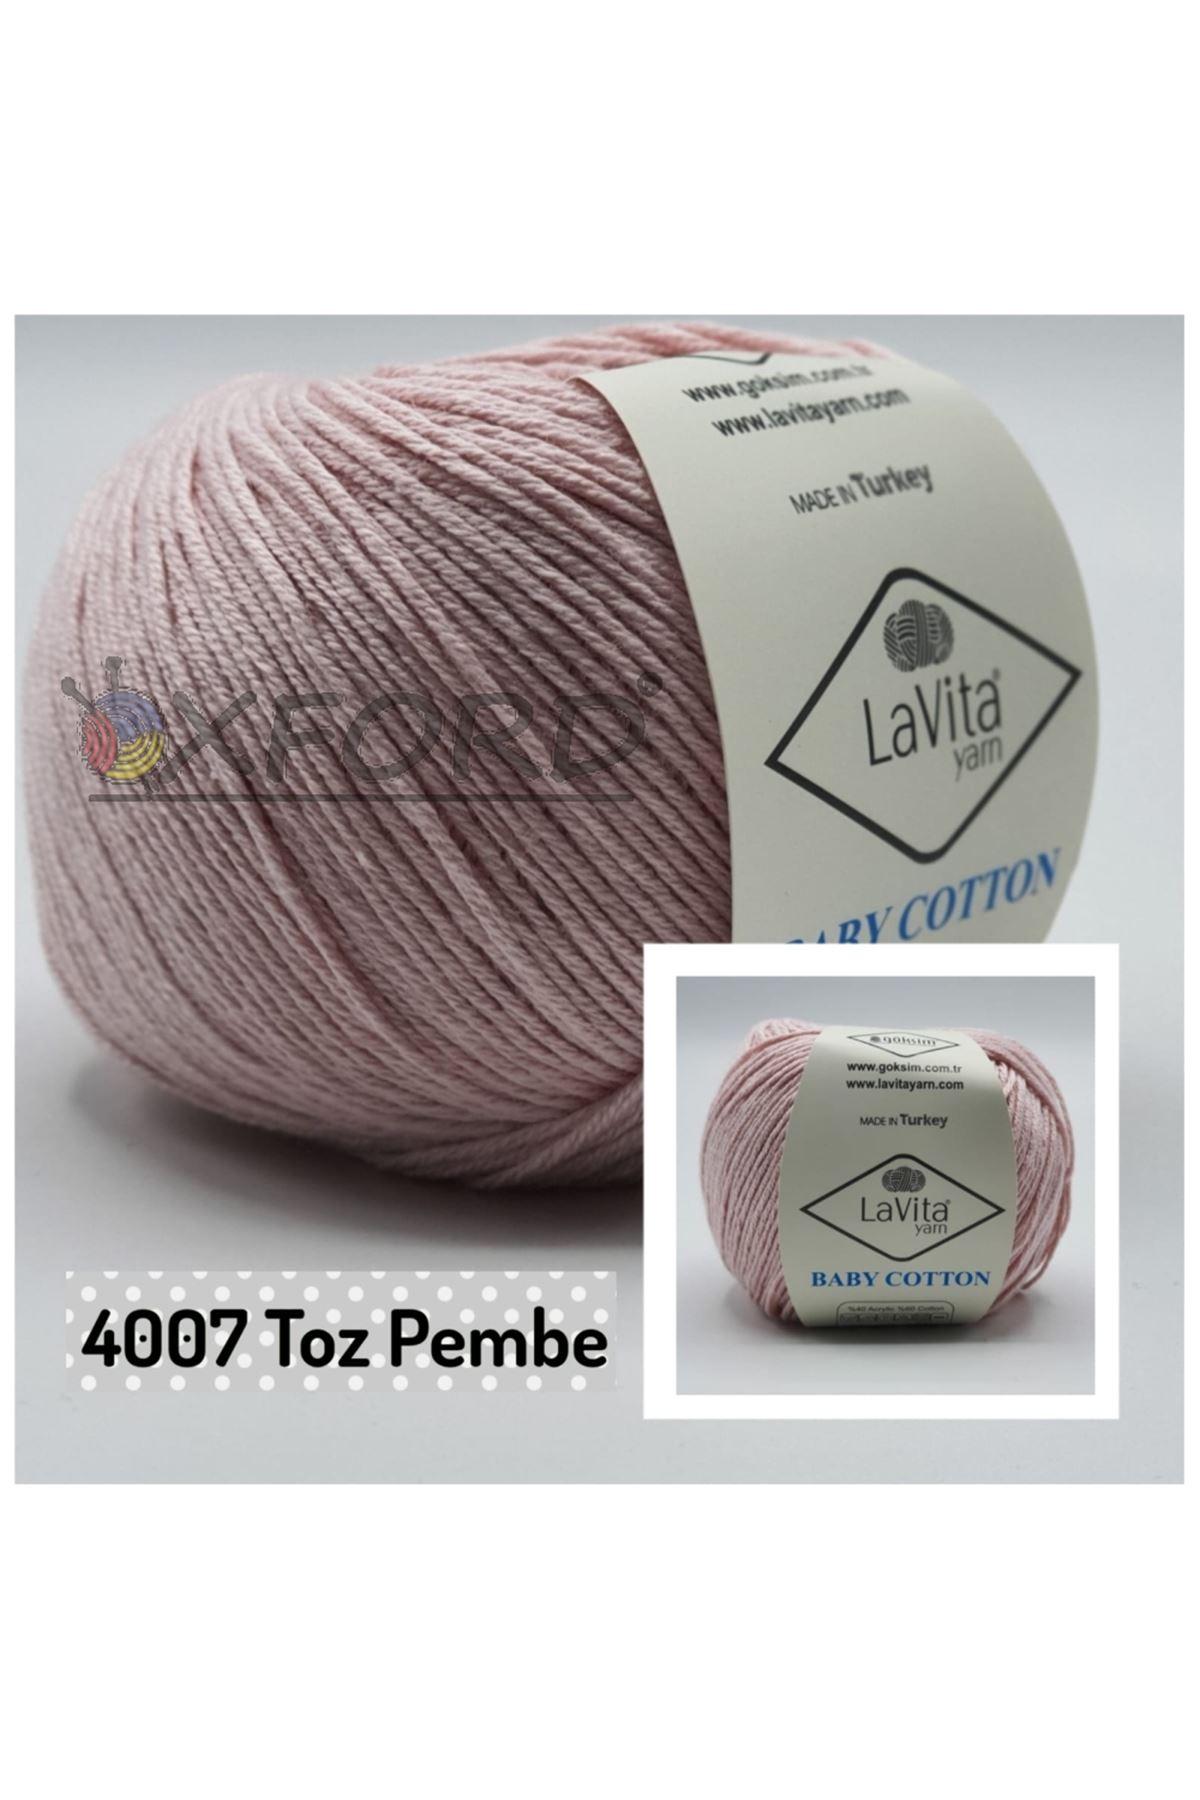 Lavita Baby Cotton 4007 Toz Pembe